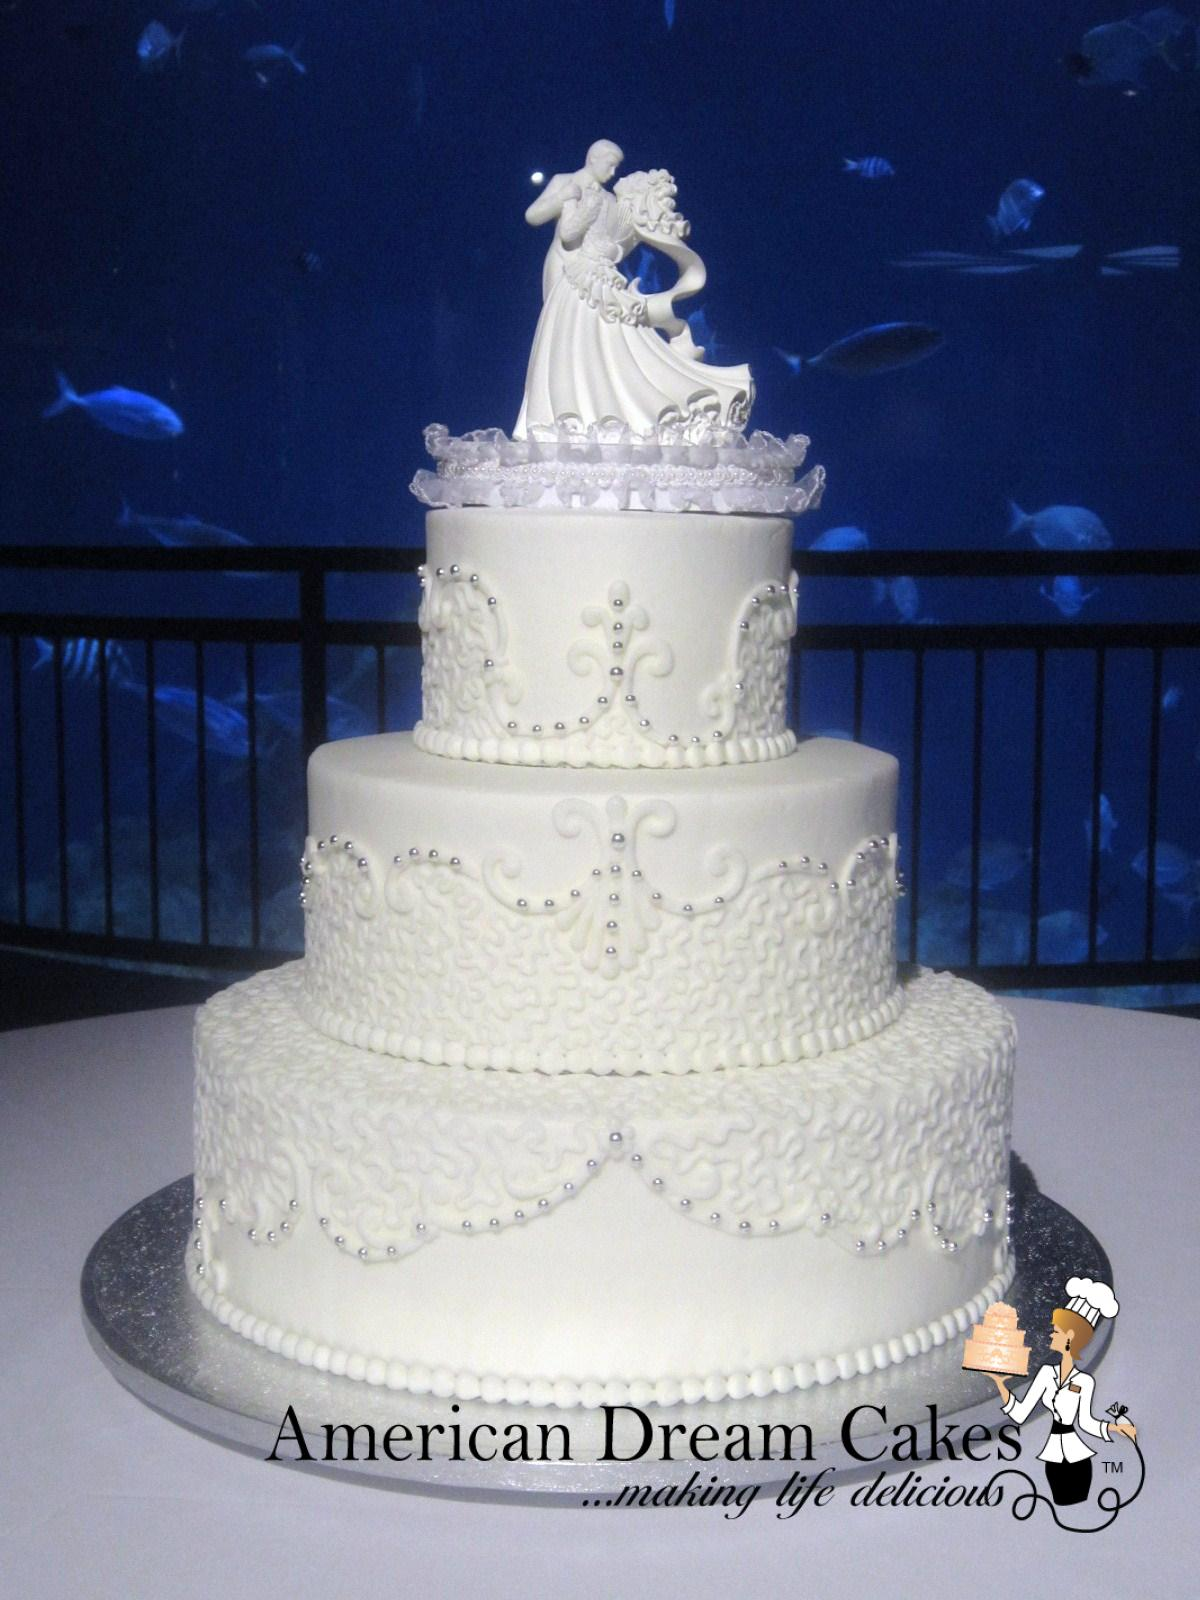 Jacksonville Cakes